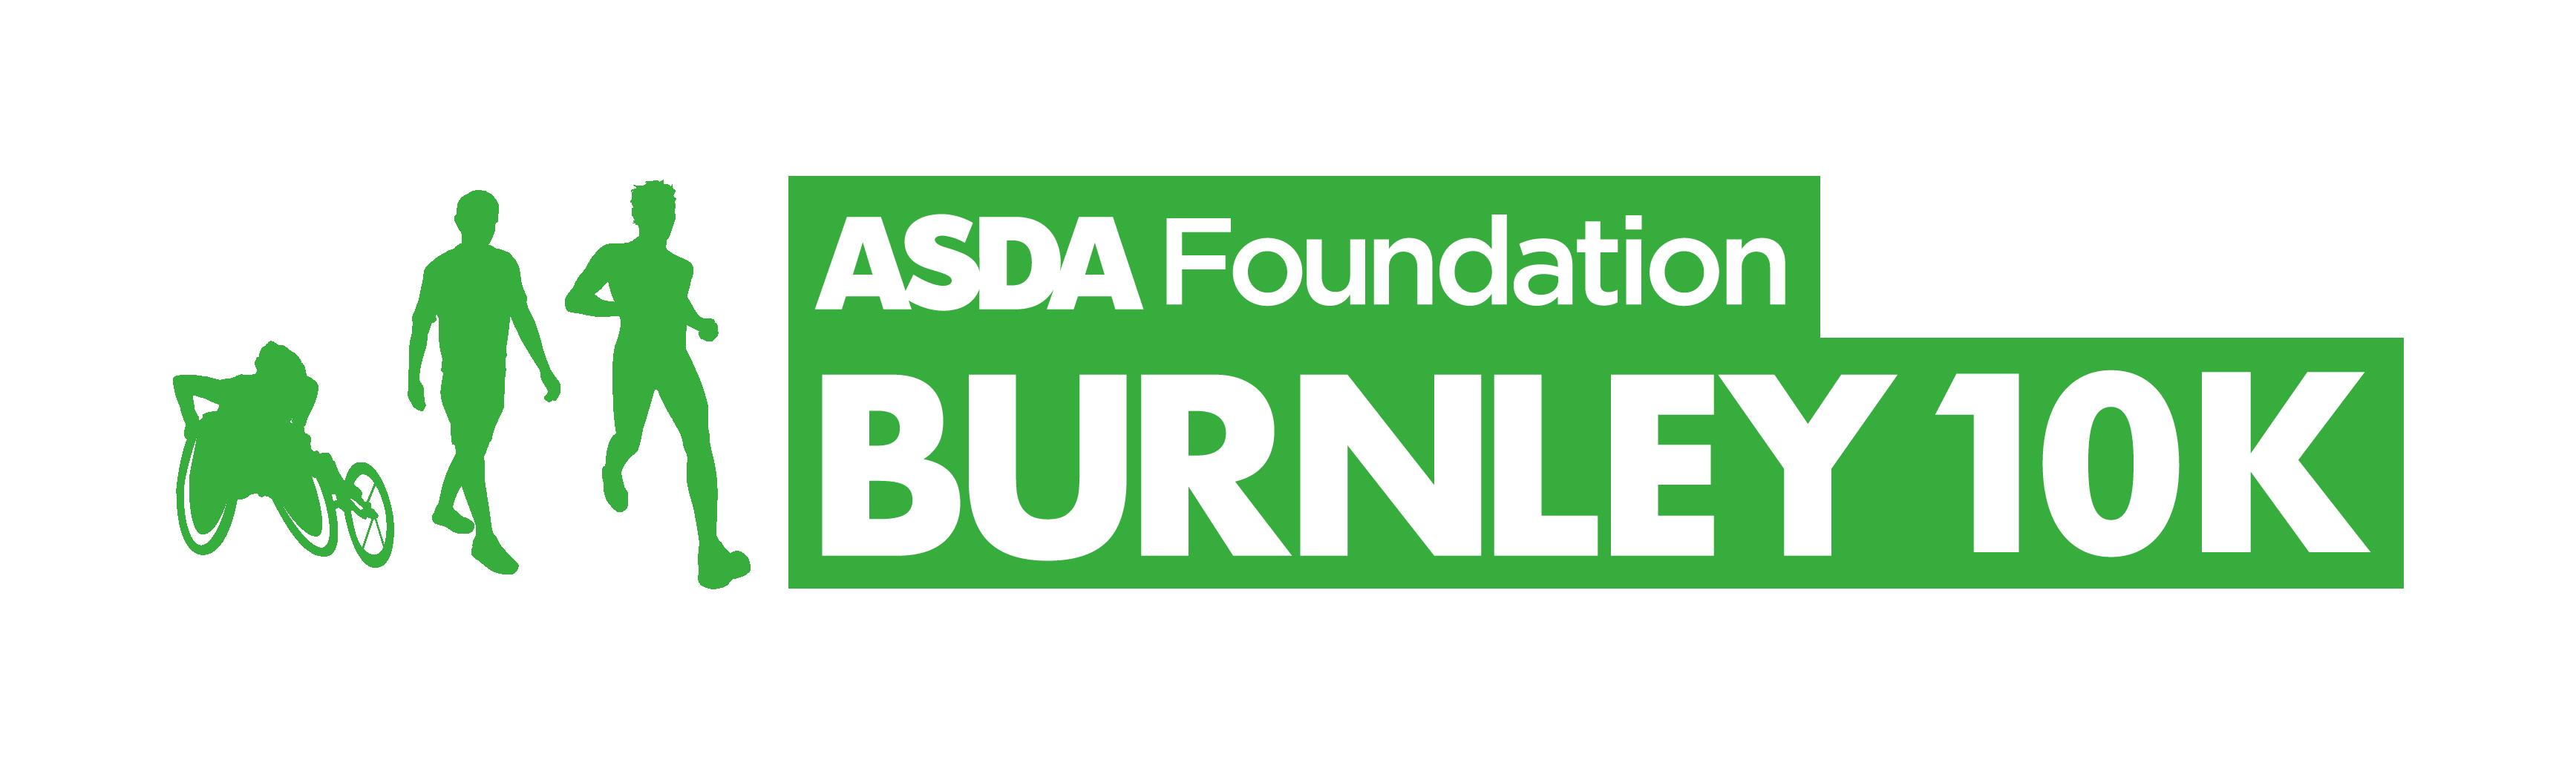 ASDA Foundation Burnley 10K - cover image